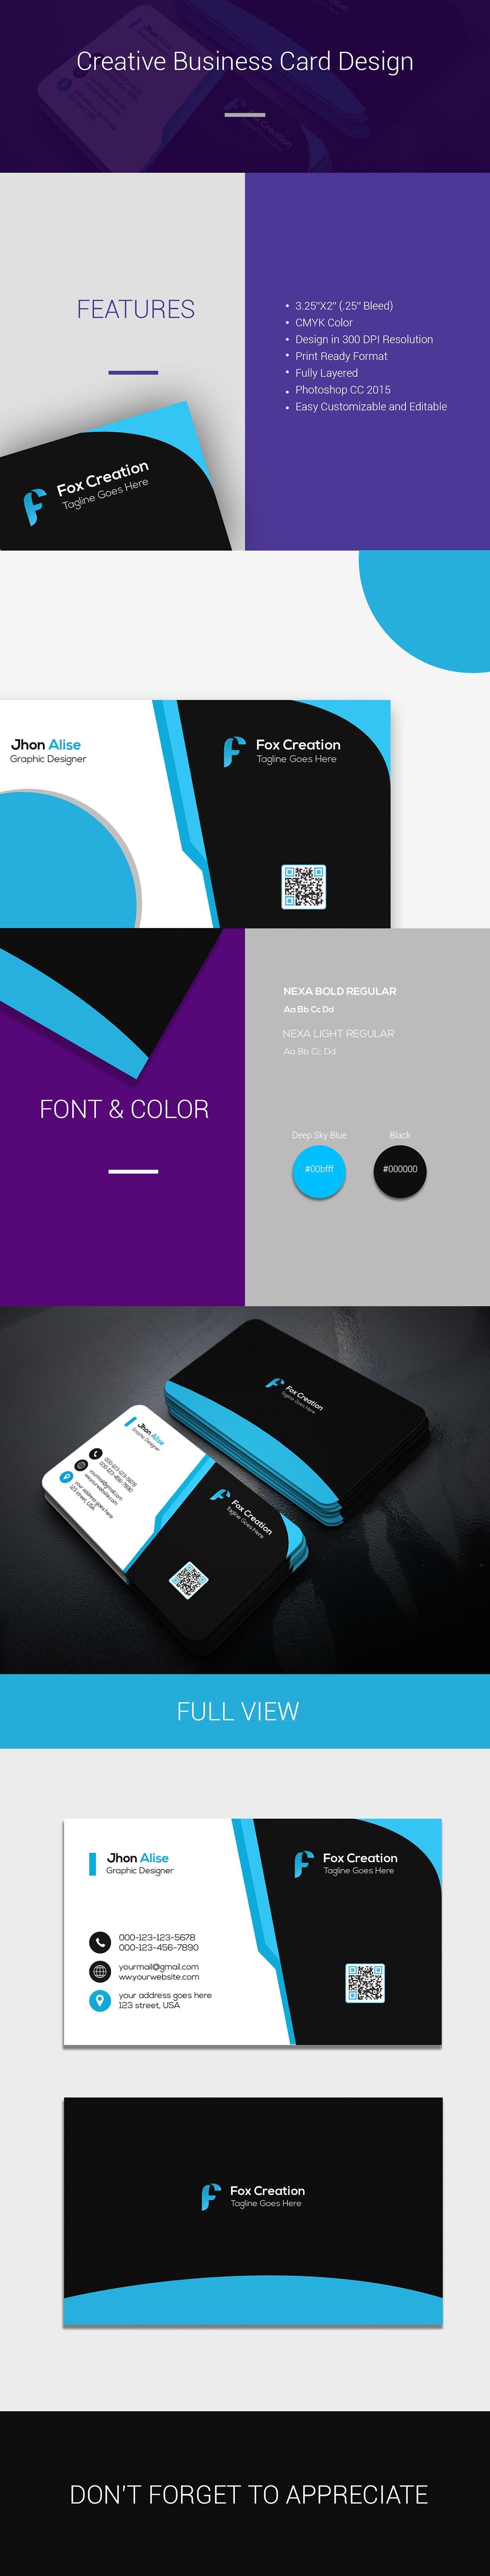 Free Creative Business Card Design